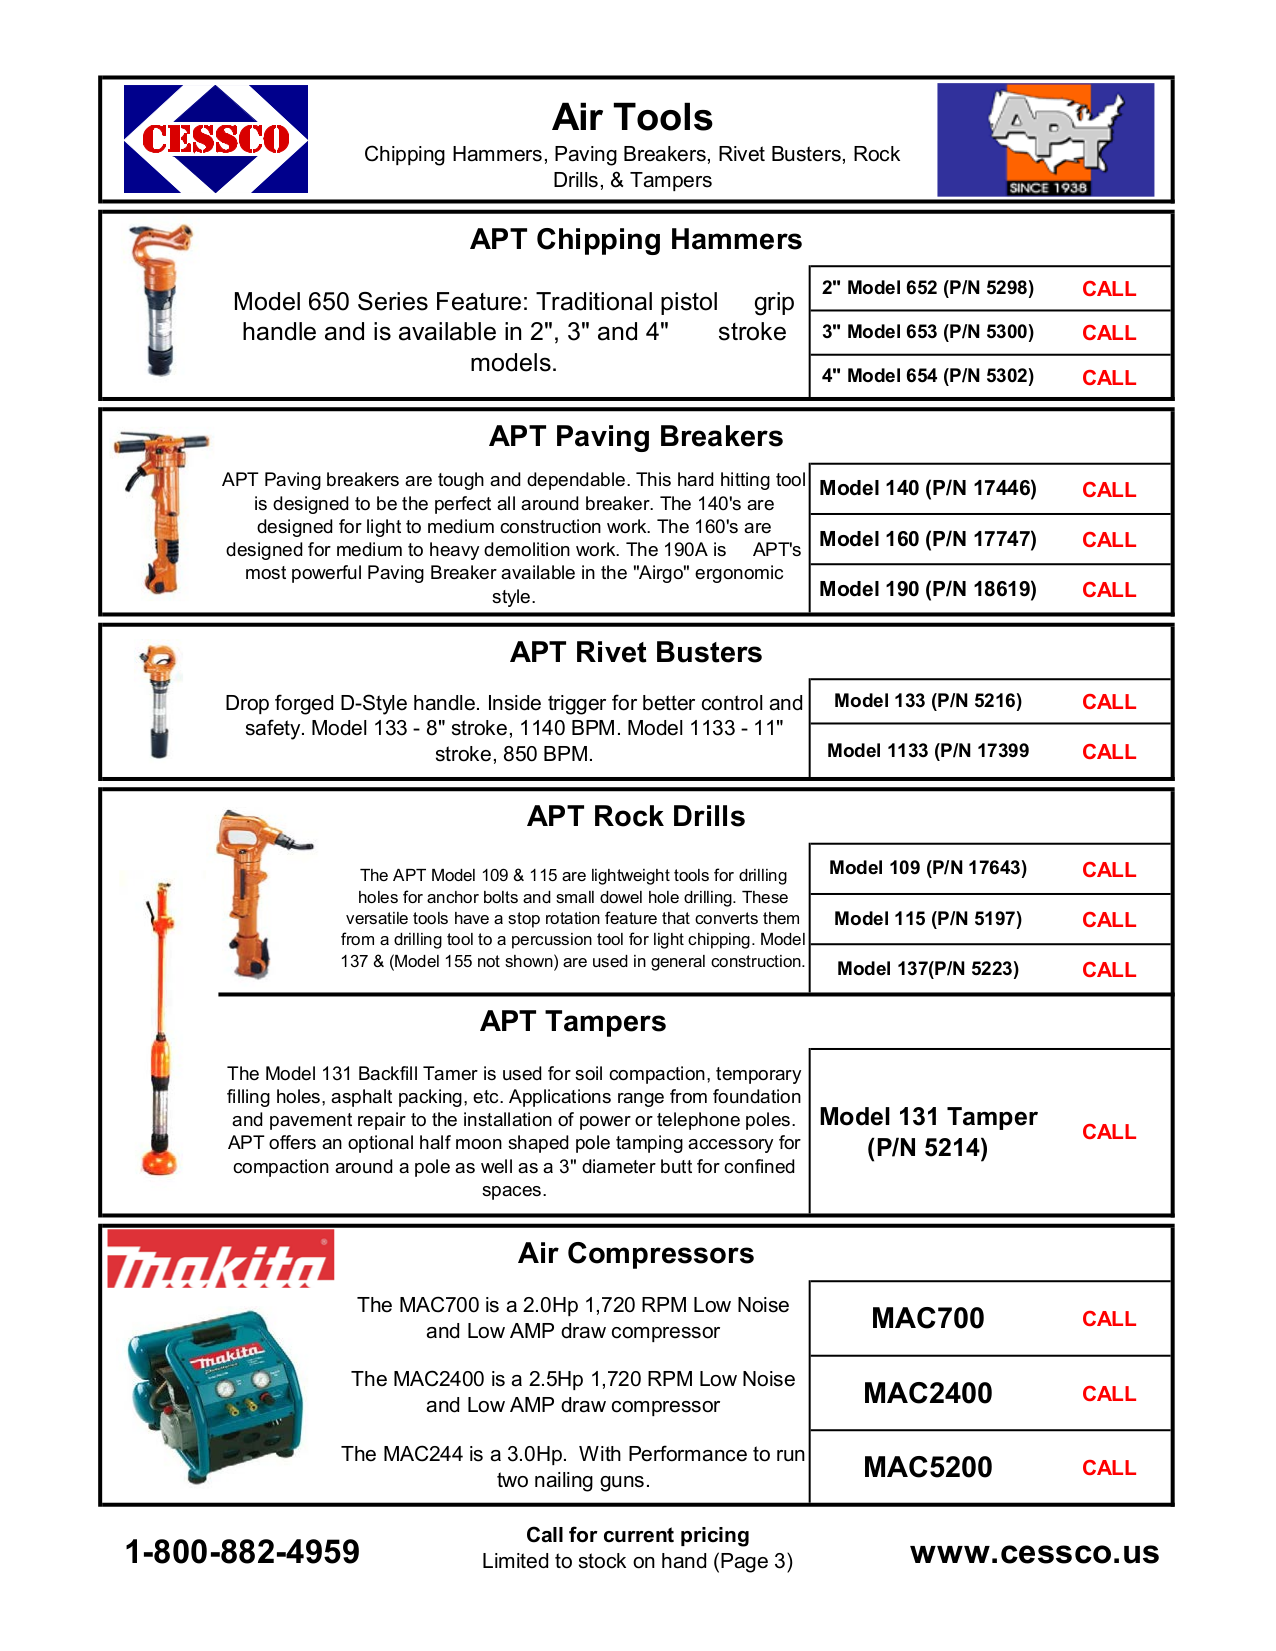 PDF manual for Makita Other MAC700 Air Compressor